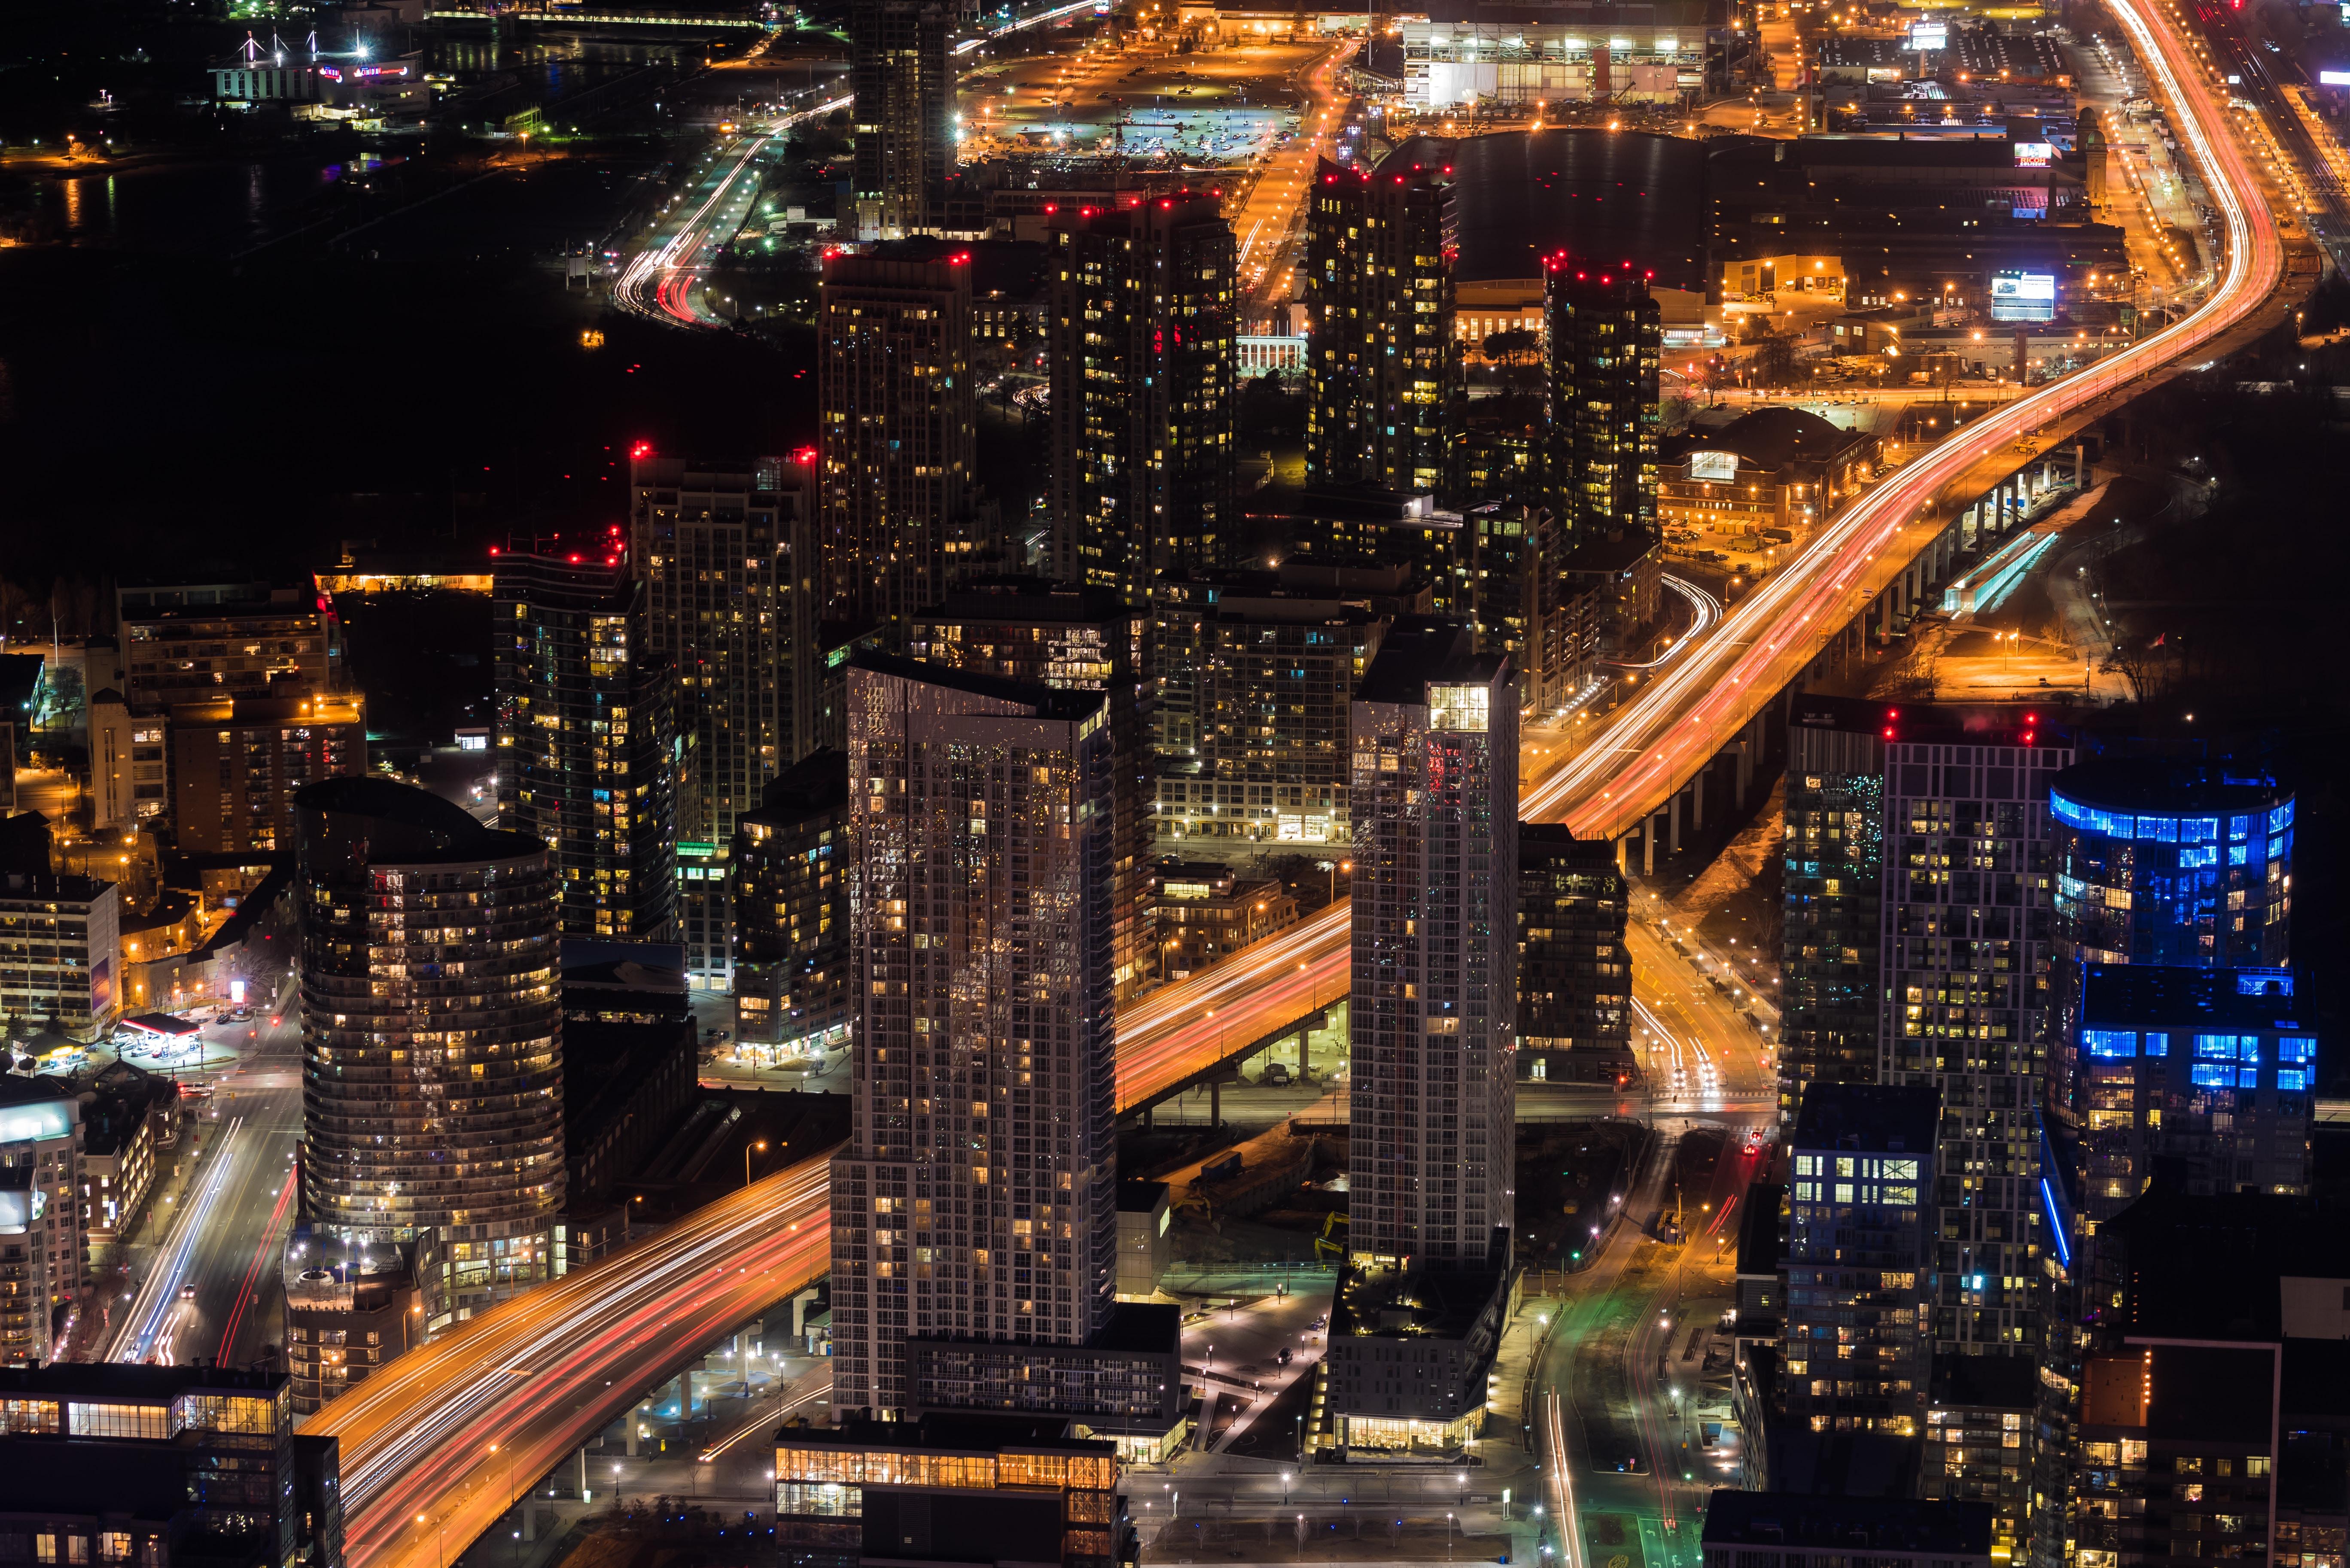 Aerial drone shot of a bustling metropolis at night